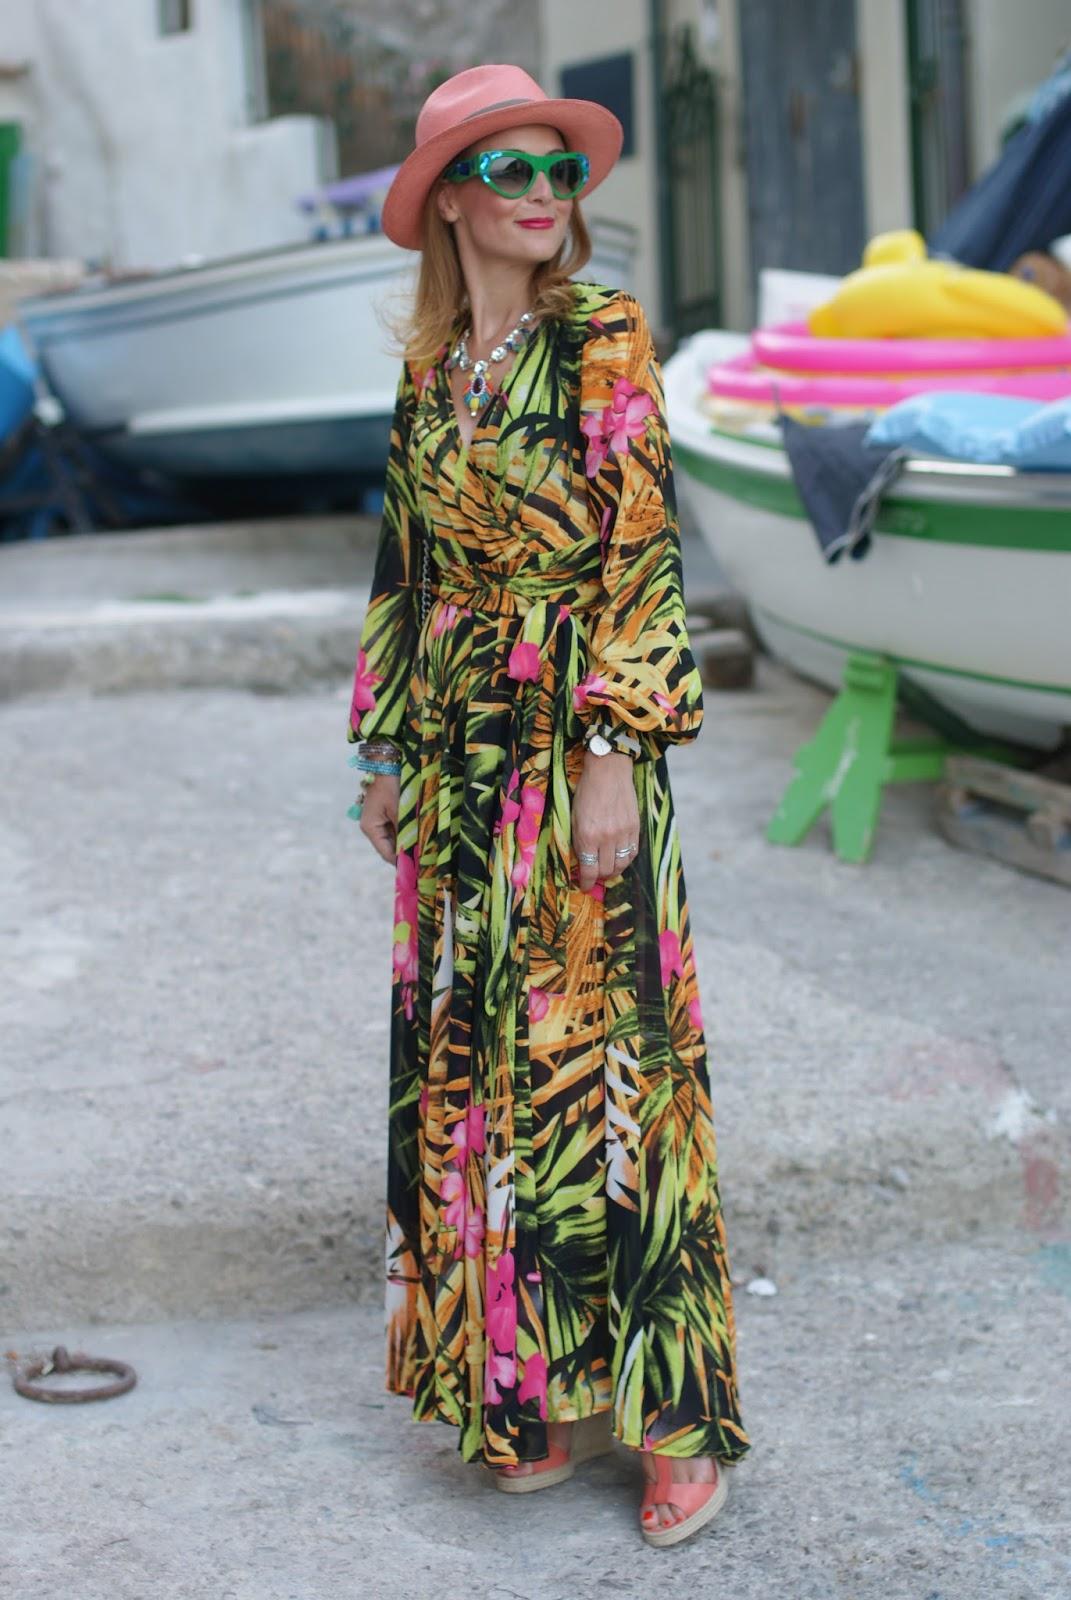 prada voice sunglasses found on giarre dot com, tropical print chiffon maxi dress, ecua-andino hat for a summer boho style with espadrilles on Fashion and Cookies fashion blog, fashion blogger style